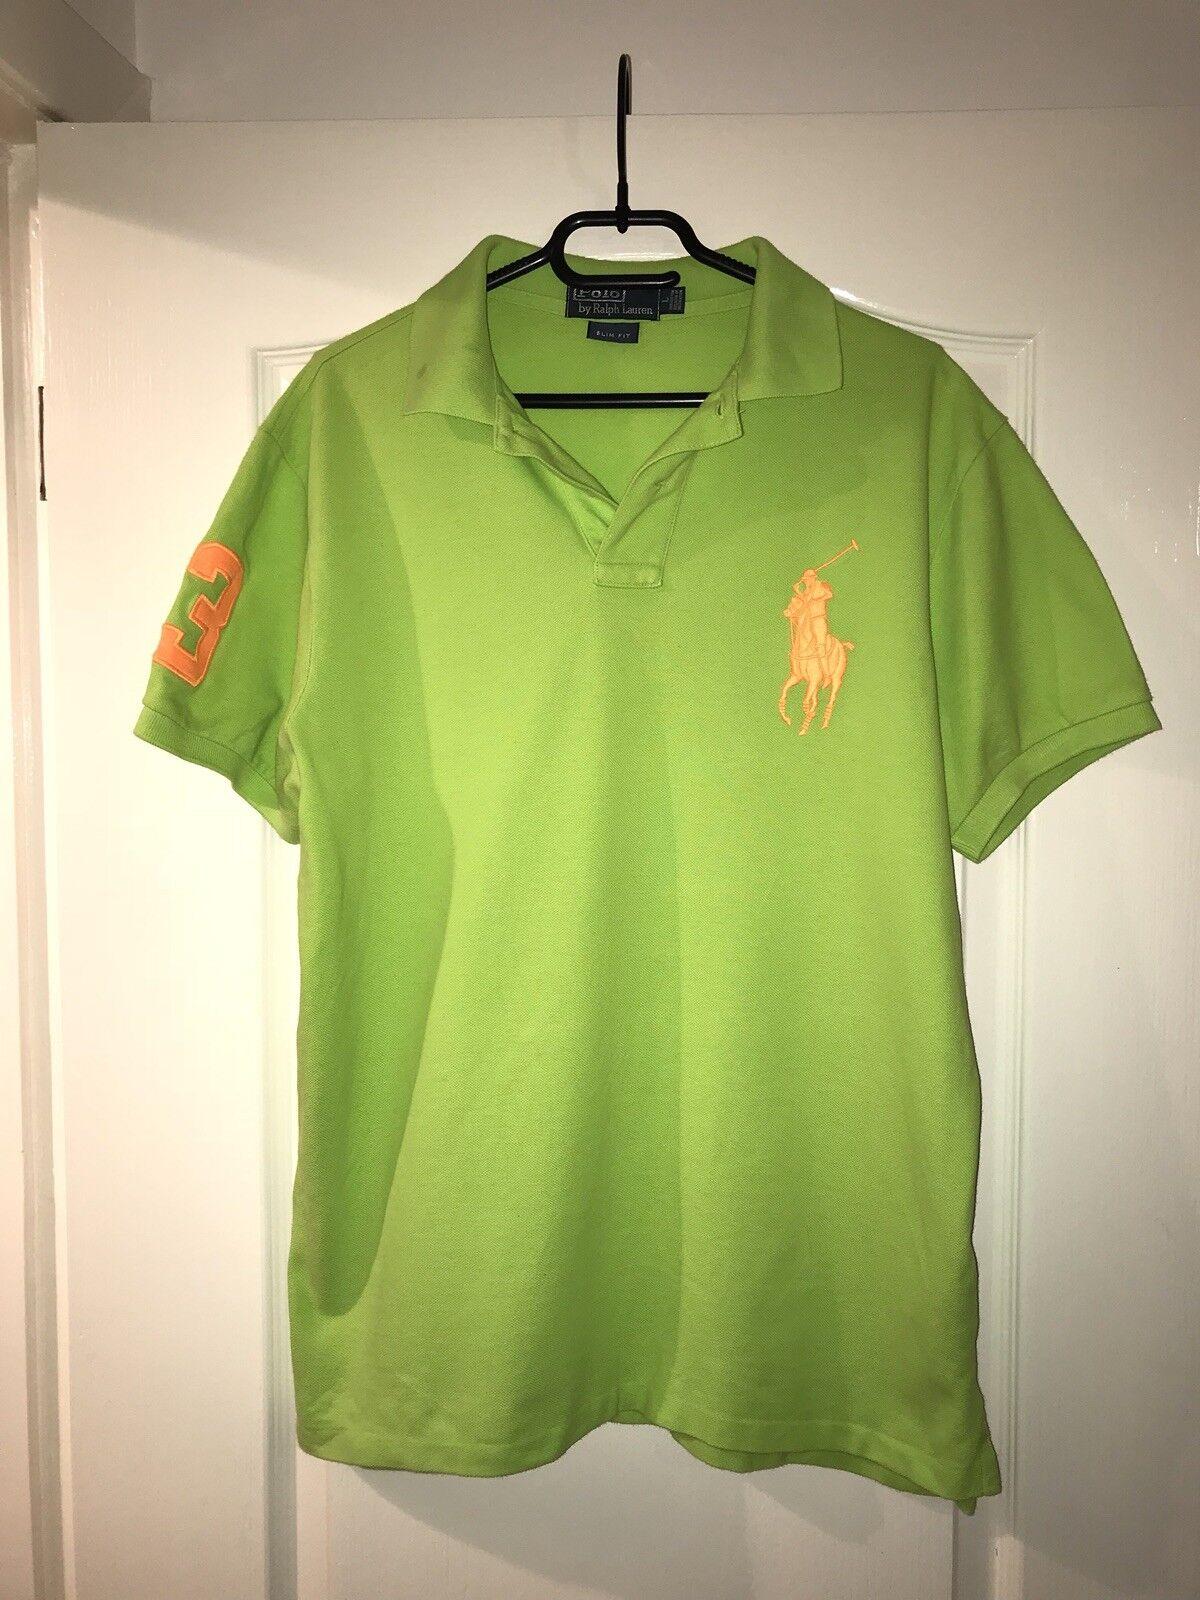 aaba079b5 Men s Lauren Green orange Slim Fit Shirt Size Large Polo Ralph ...